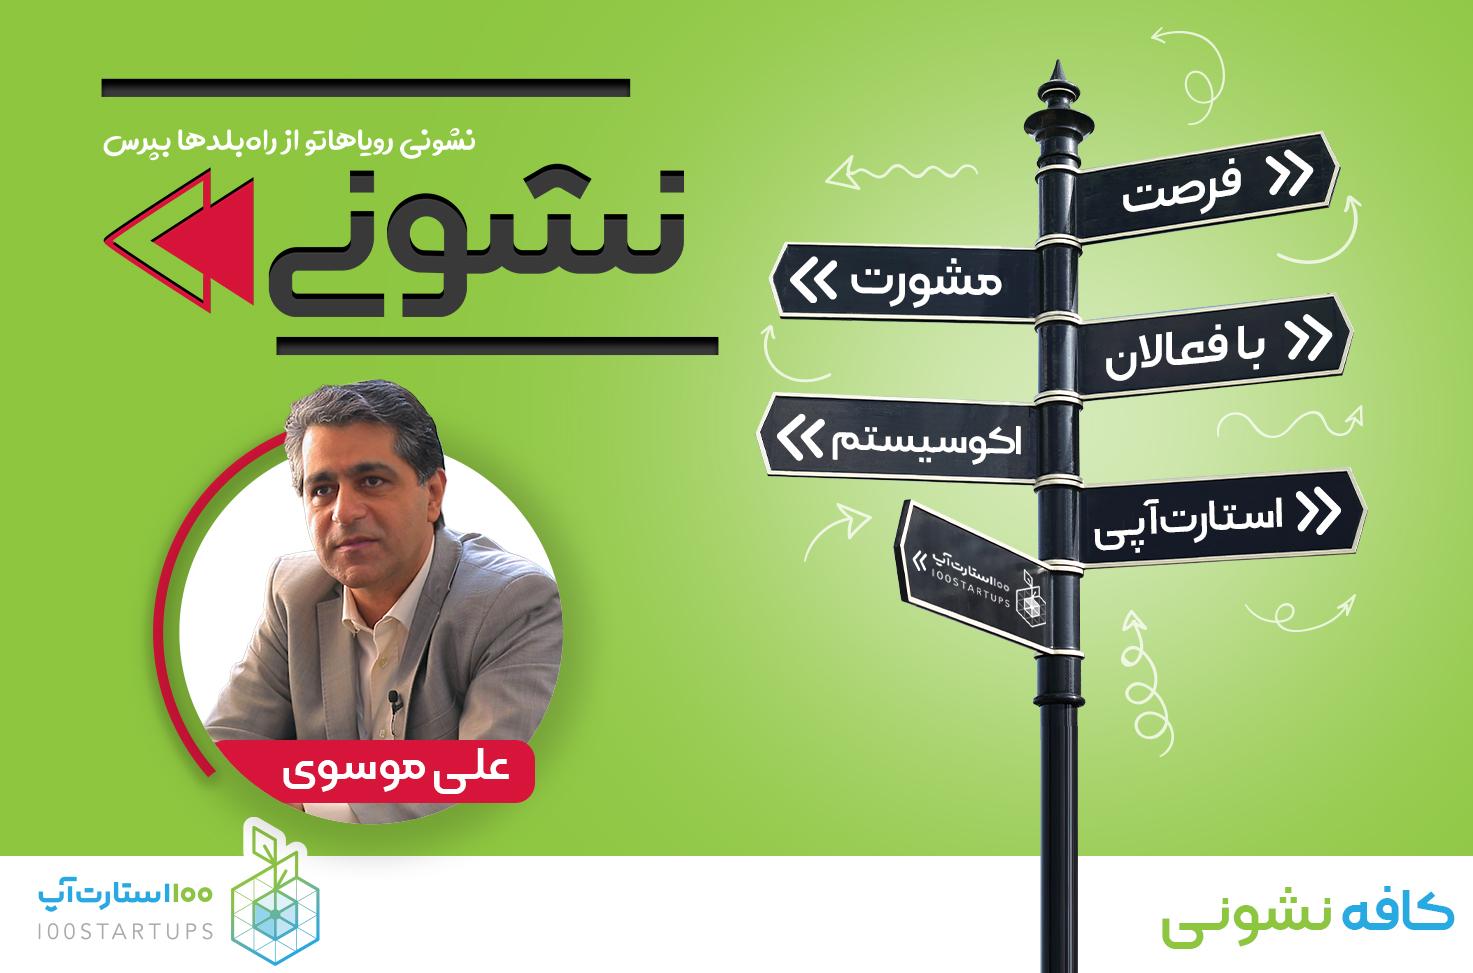 کافه نشونی، نشونی، موفقییت، راه موفقیت، نشونی موفقیت، دکتر علی موسوی، علی موسوی، 100استارتاپ، استارتاپ، استارتآپ